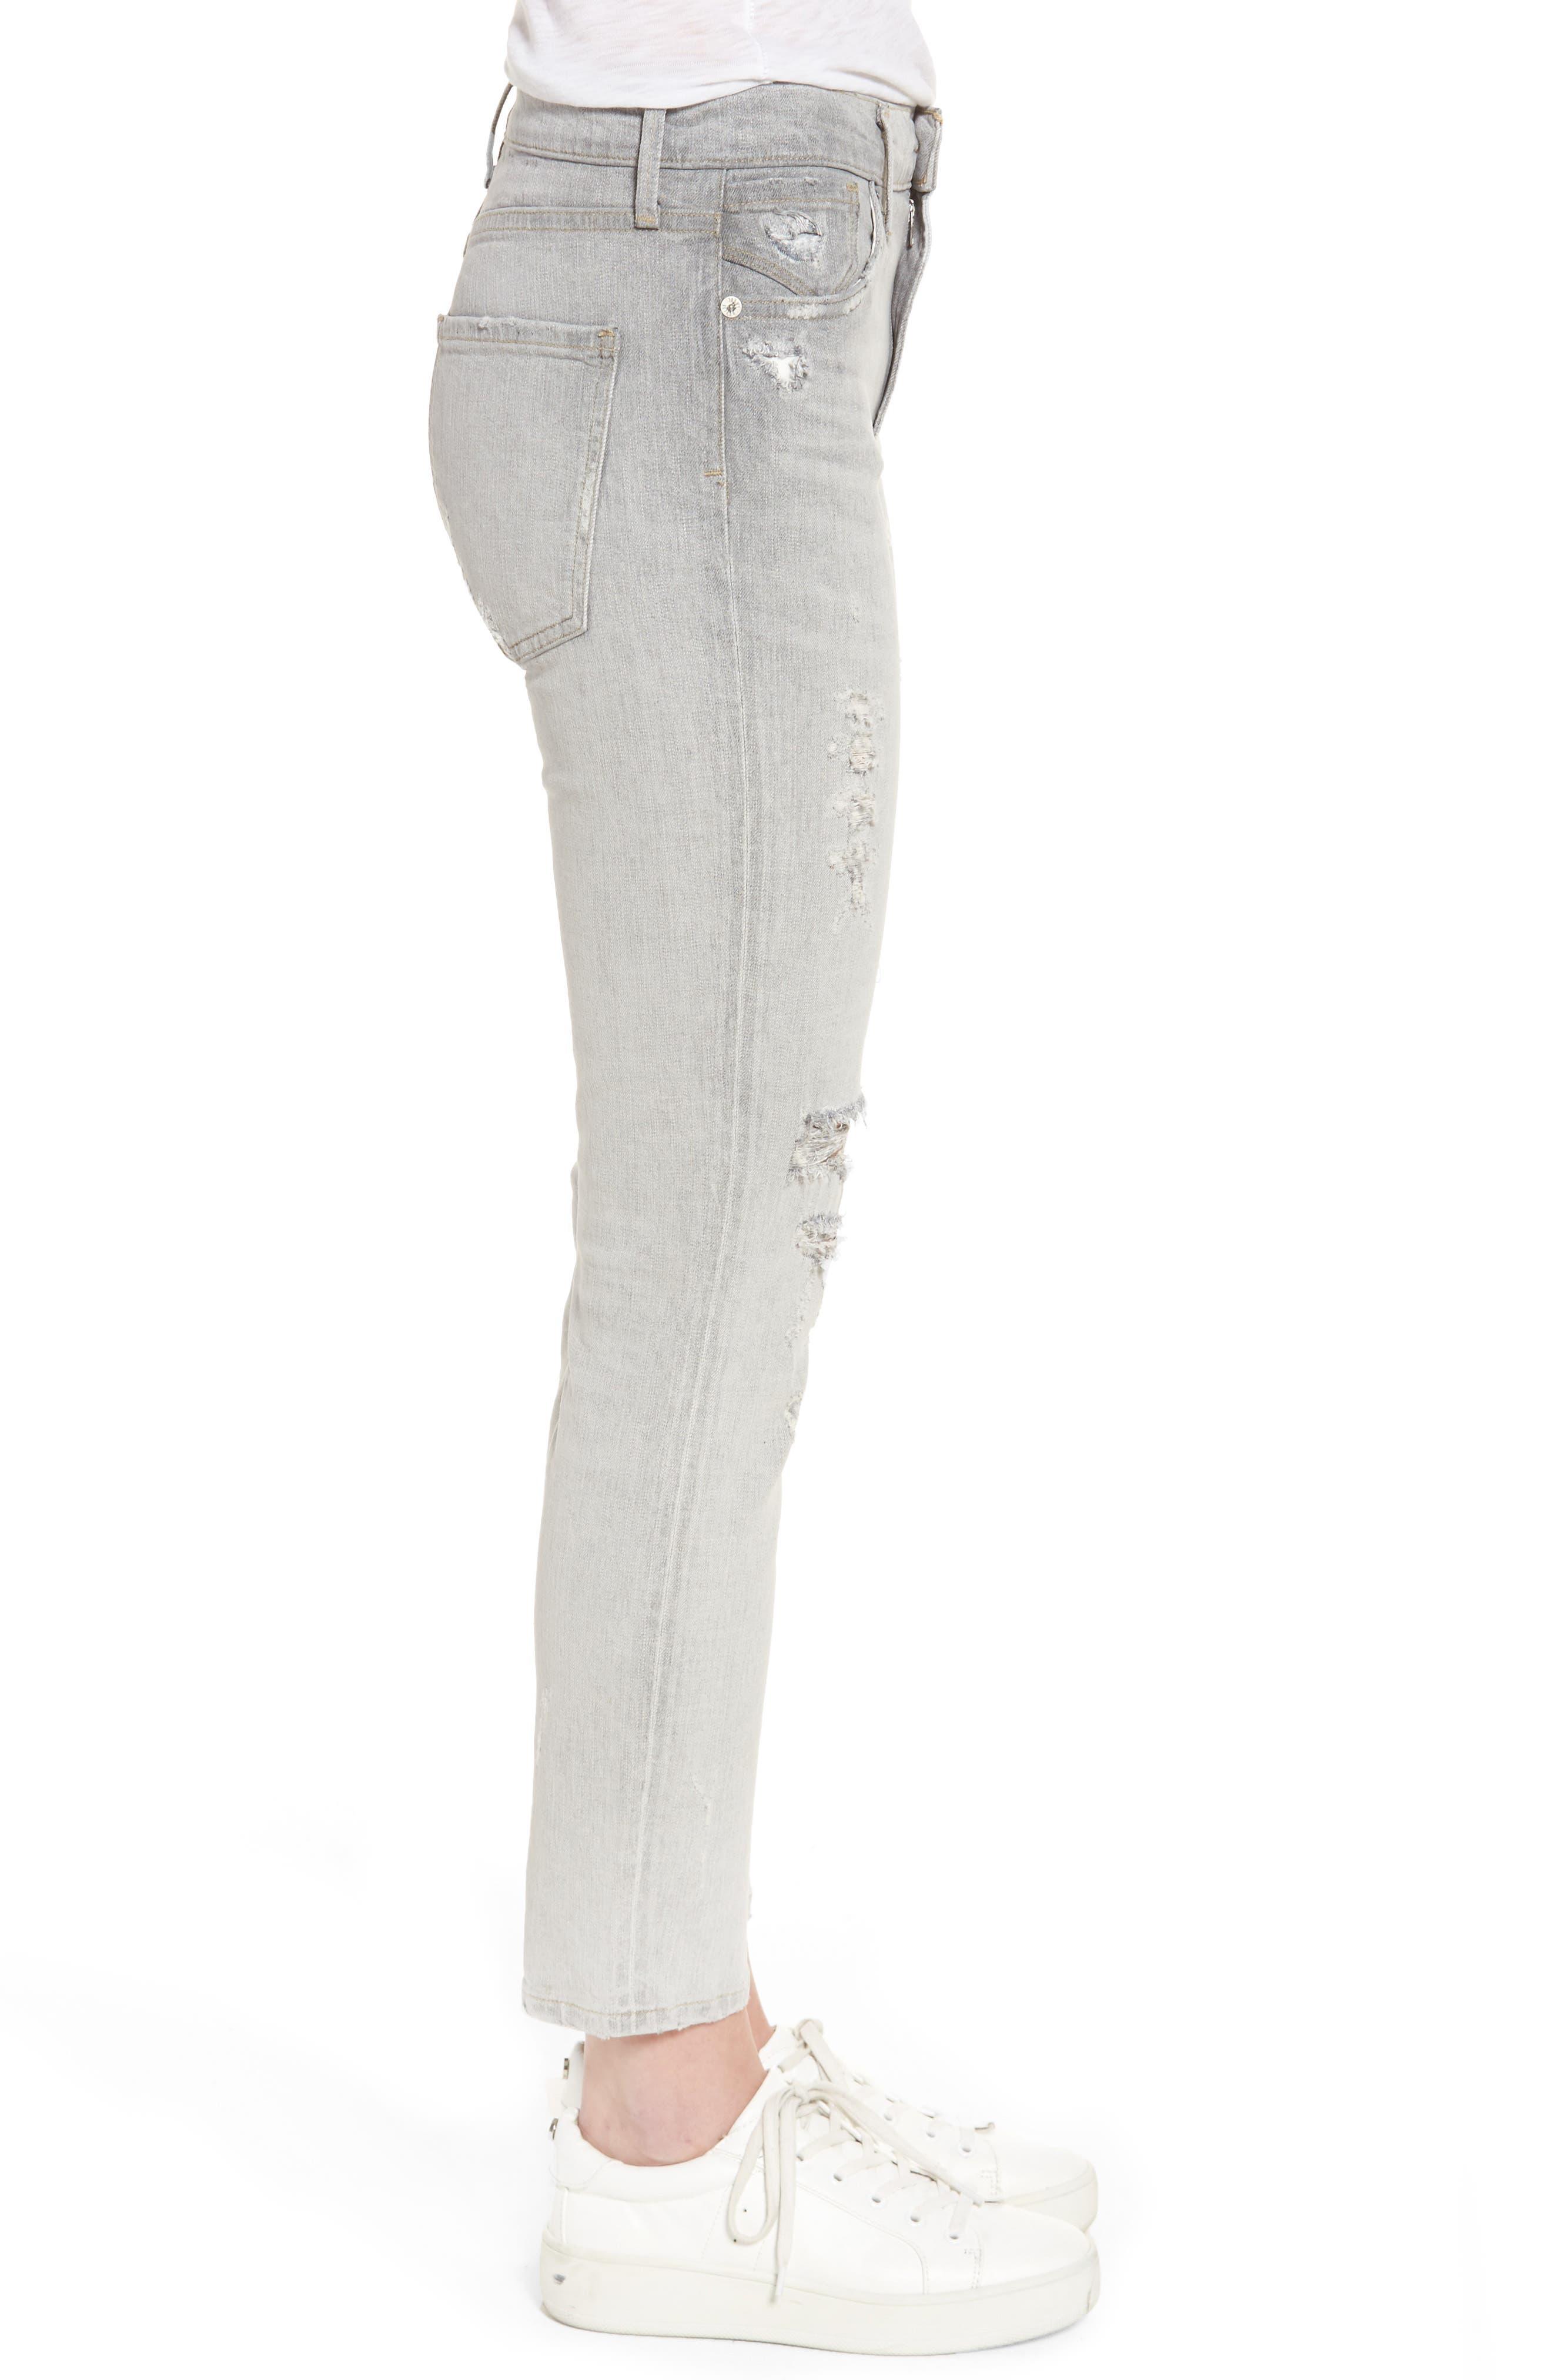 Sophie High Waist Skinny Jeans,                             Alternate thumbnail 3, color,                             Portland Destruct